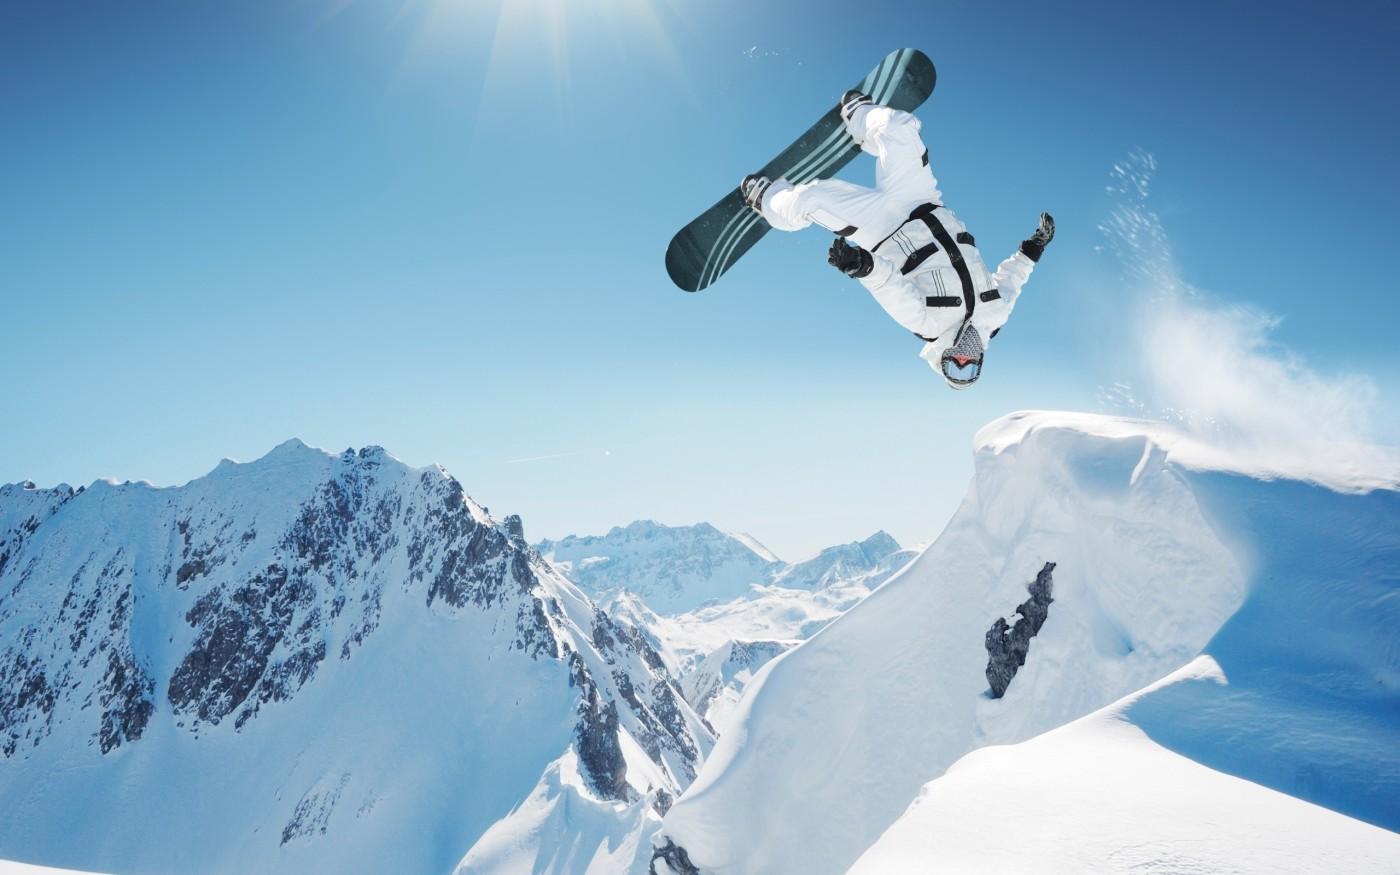 26258-extreme_snowboarding_wallpaper